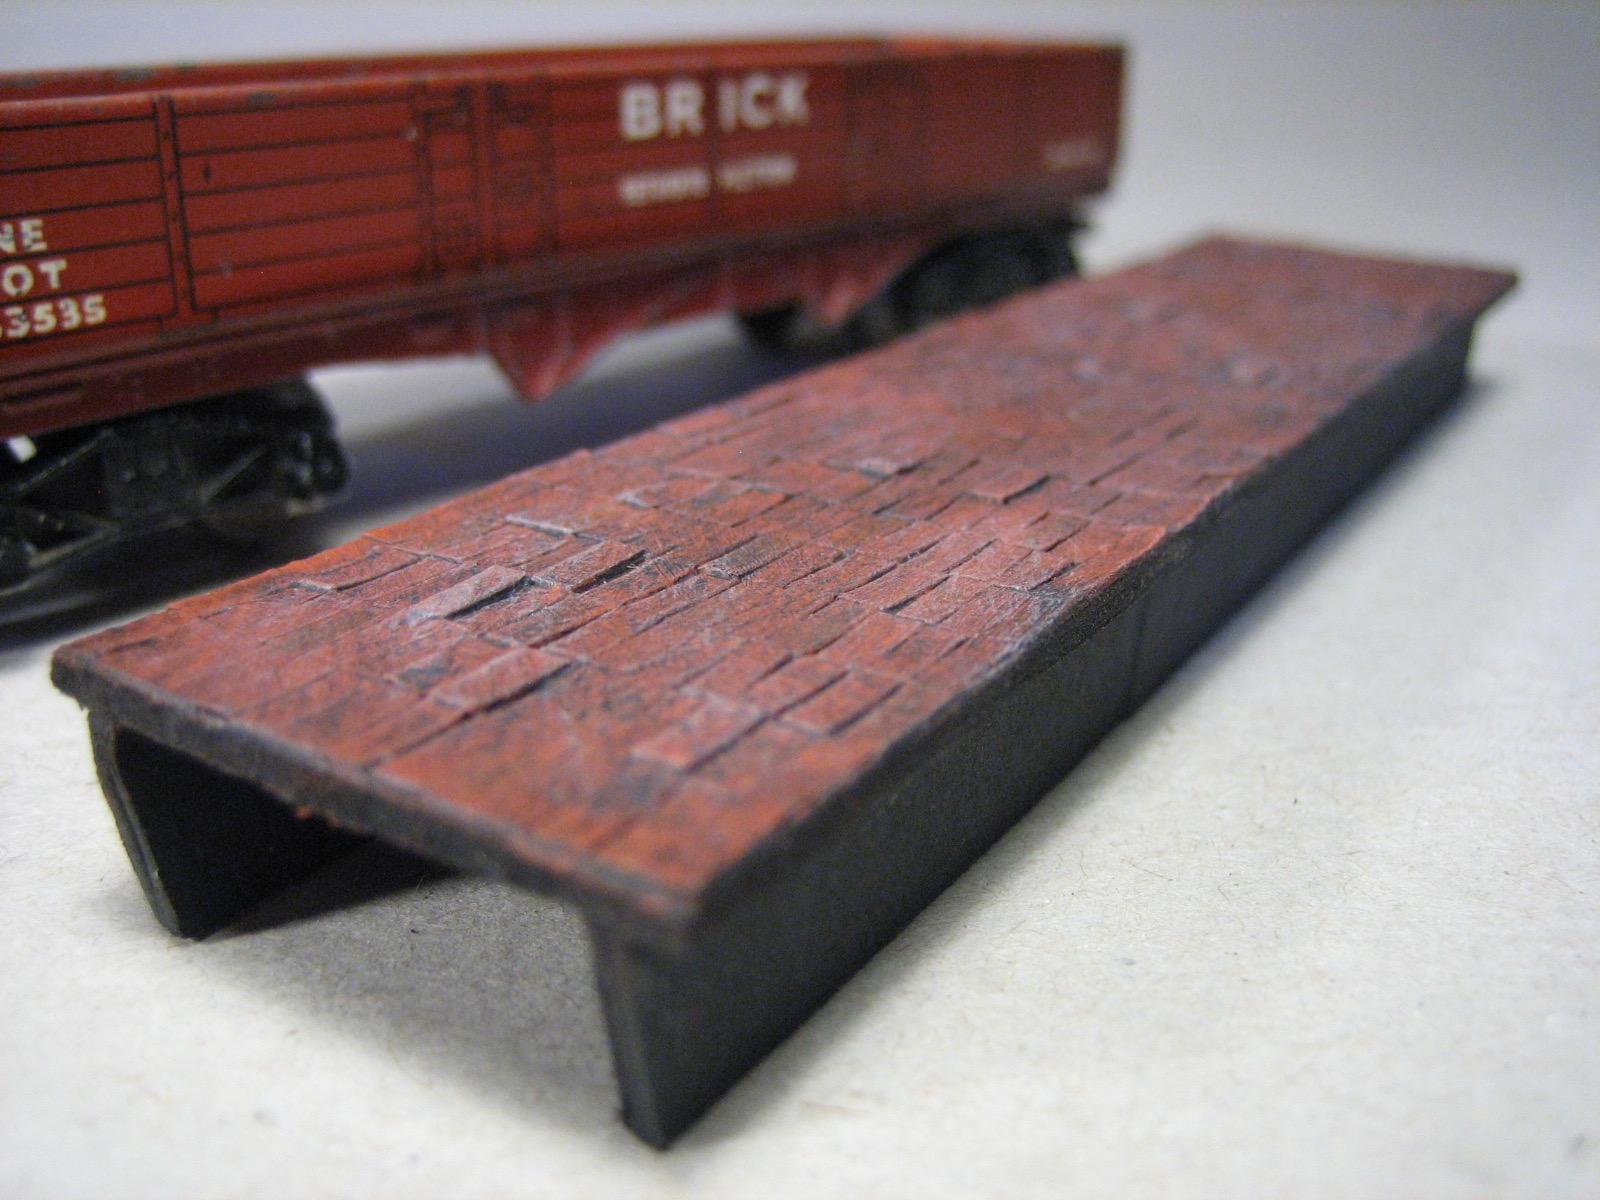 DM202 MINI CARGO HORNBY DUBLO BRICK WAGON